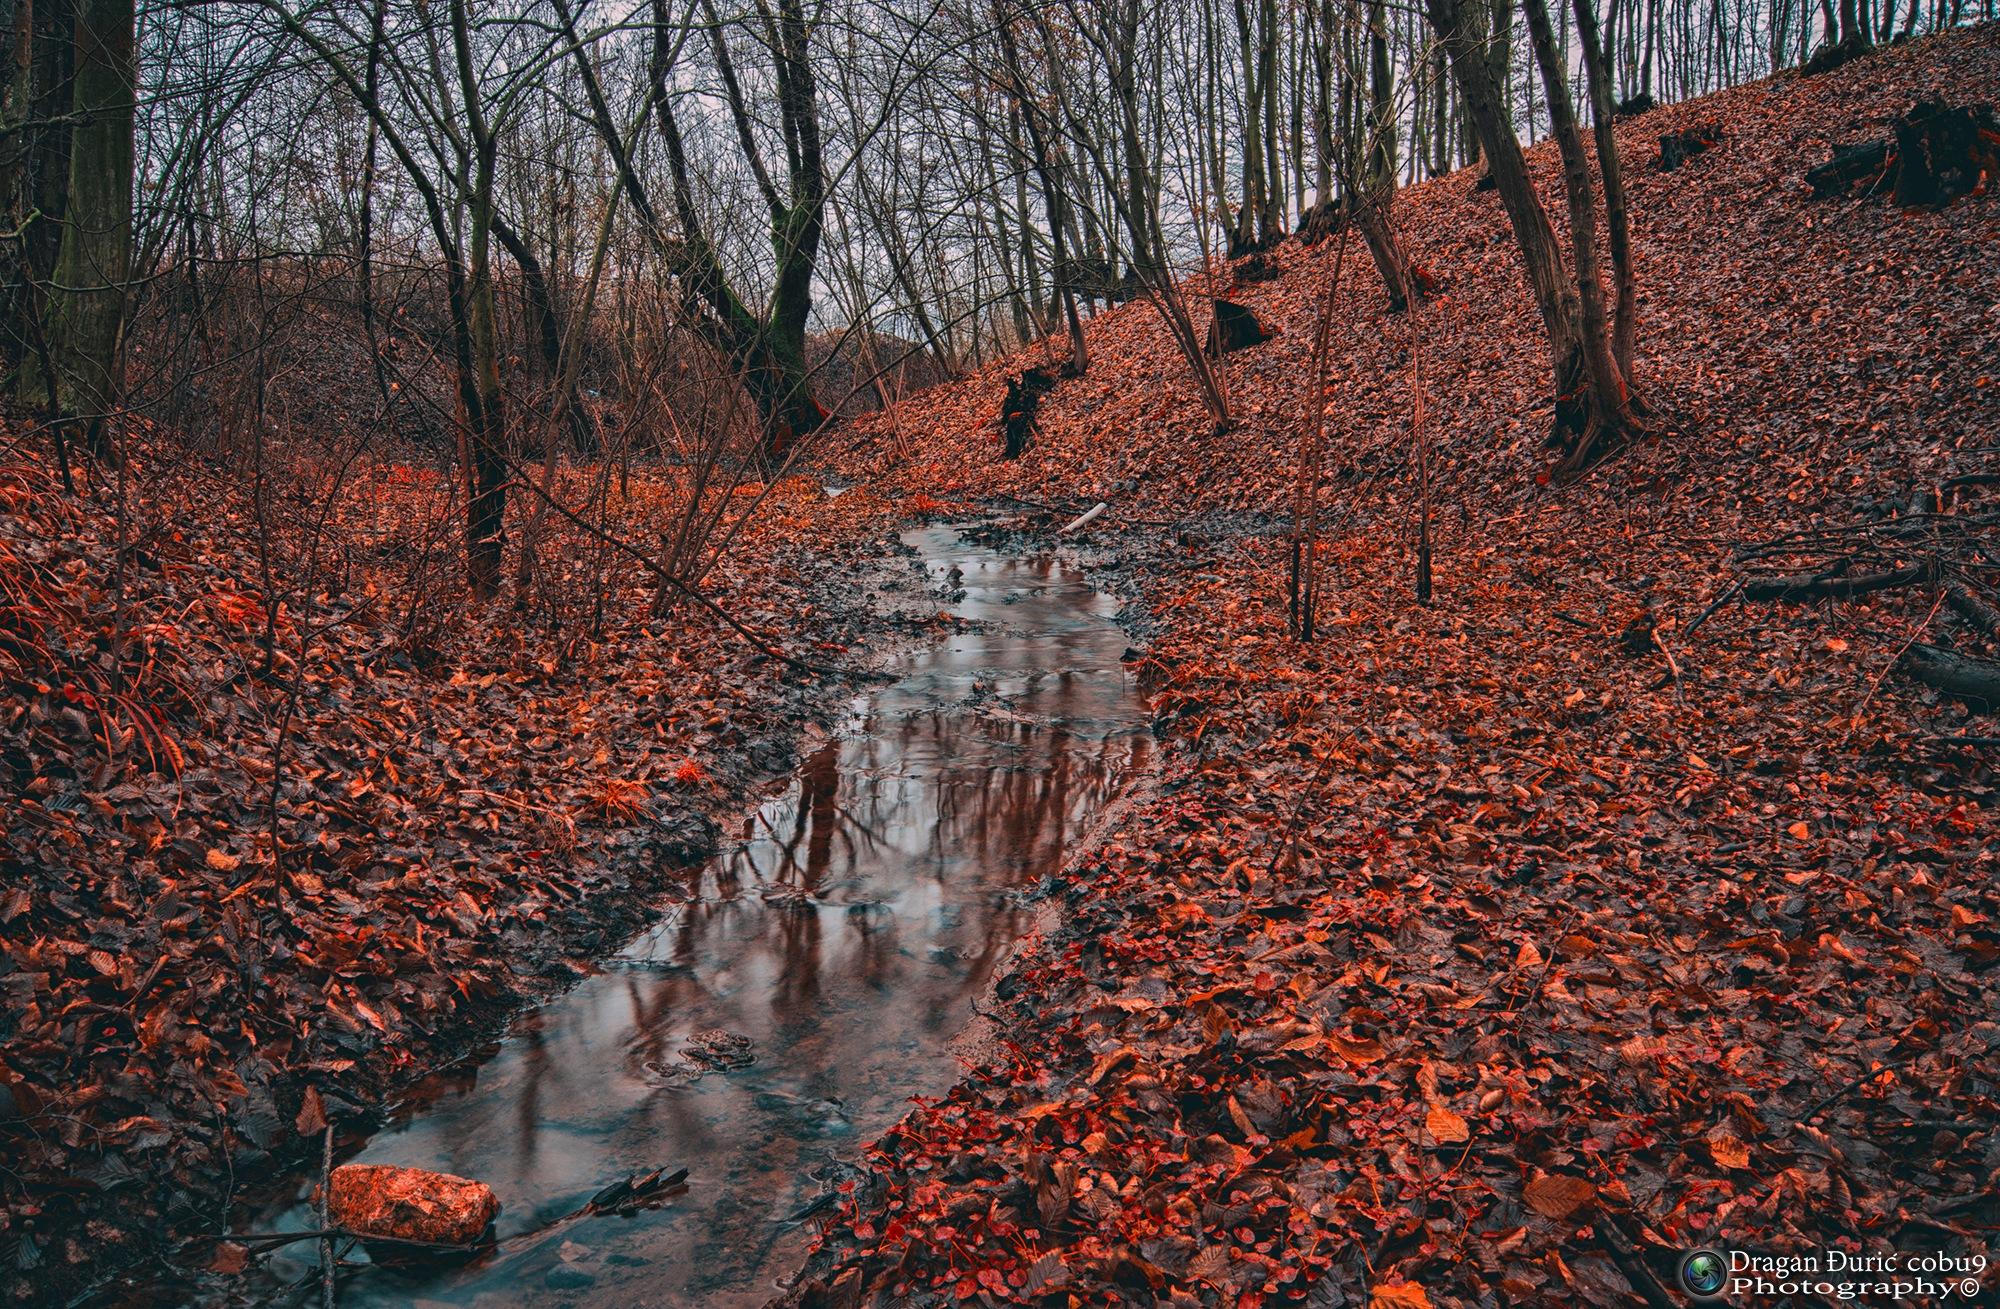 Autumn scene by Dragan Đurić